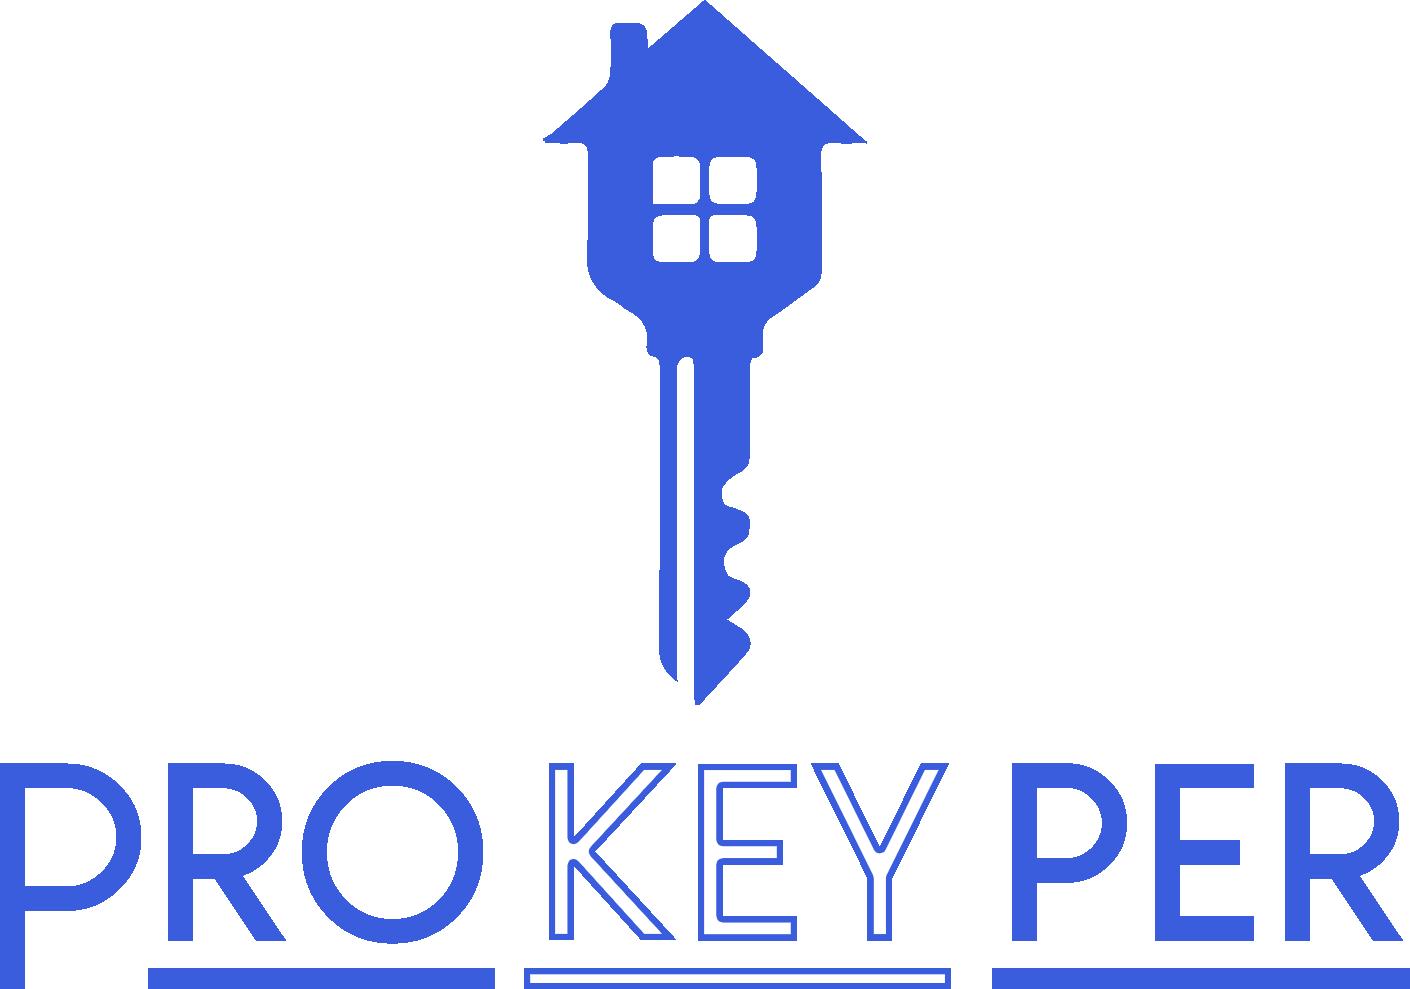 prokeyper logo